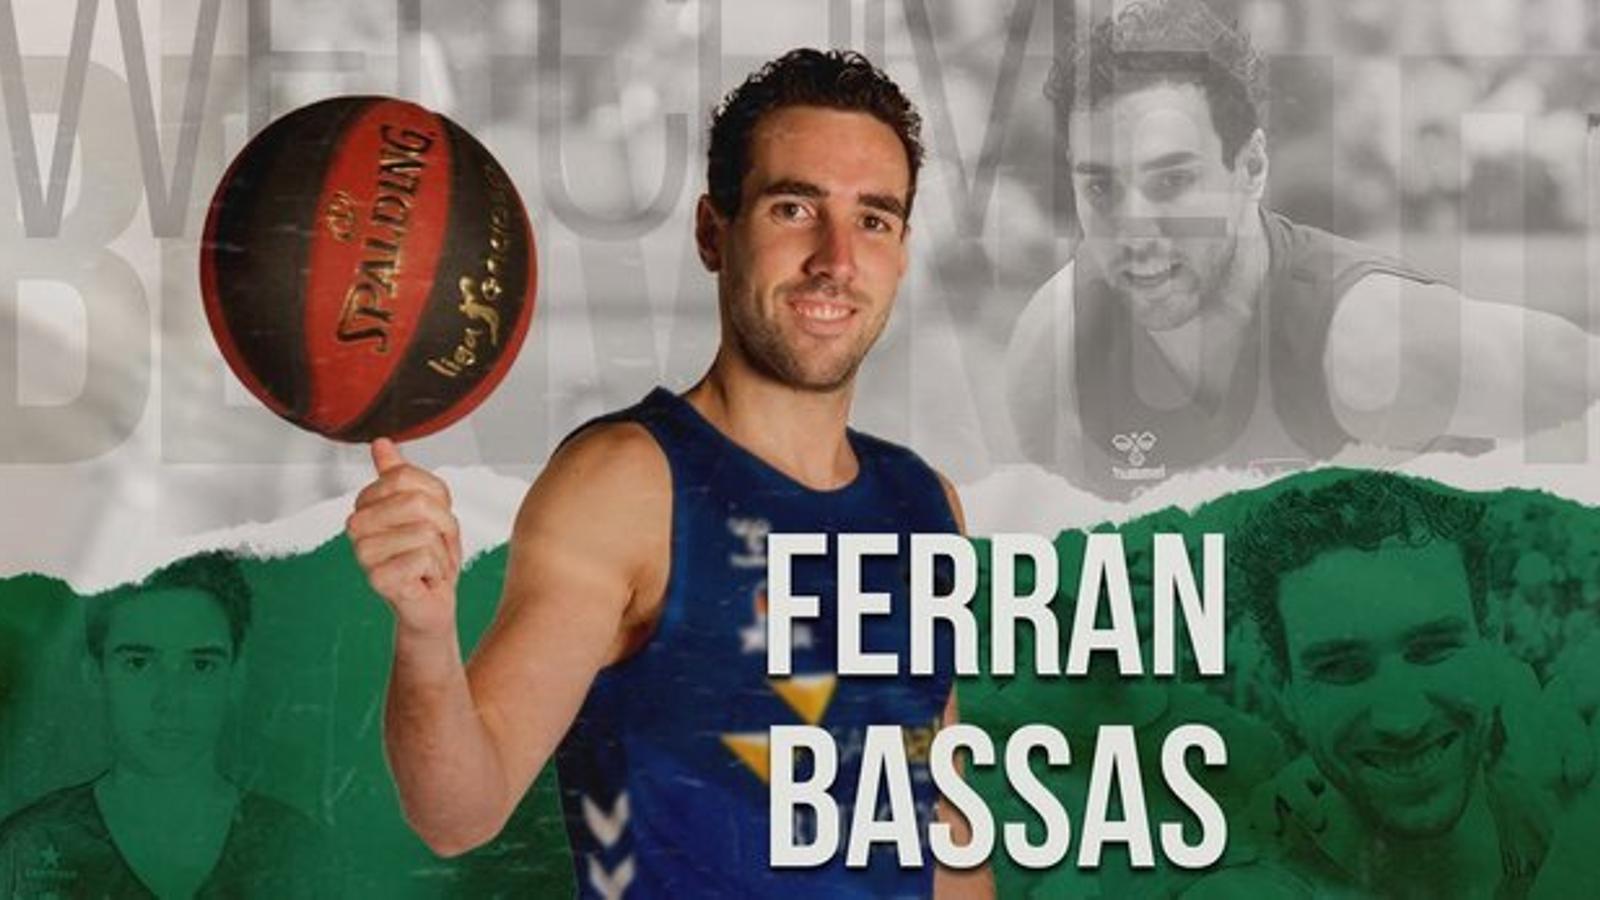 Ferran Bassas torna al Joventut de Badalona / JOVENTUT